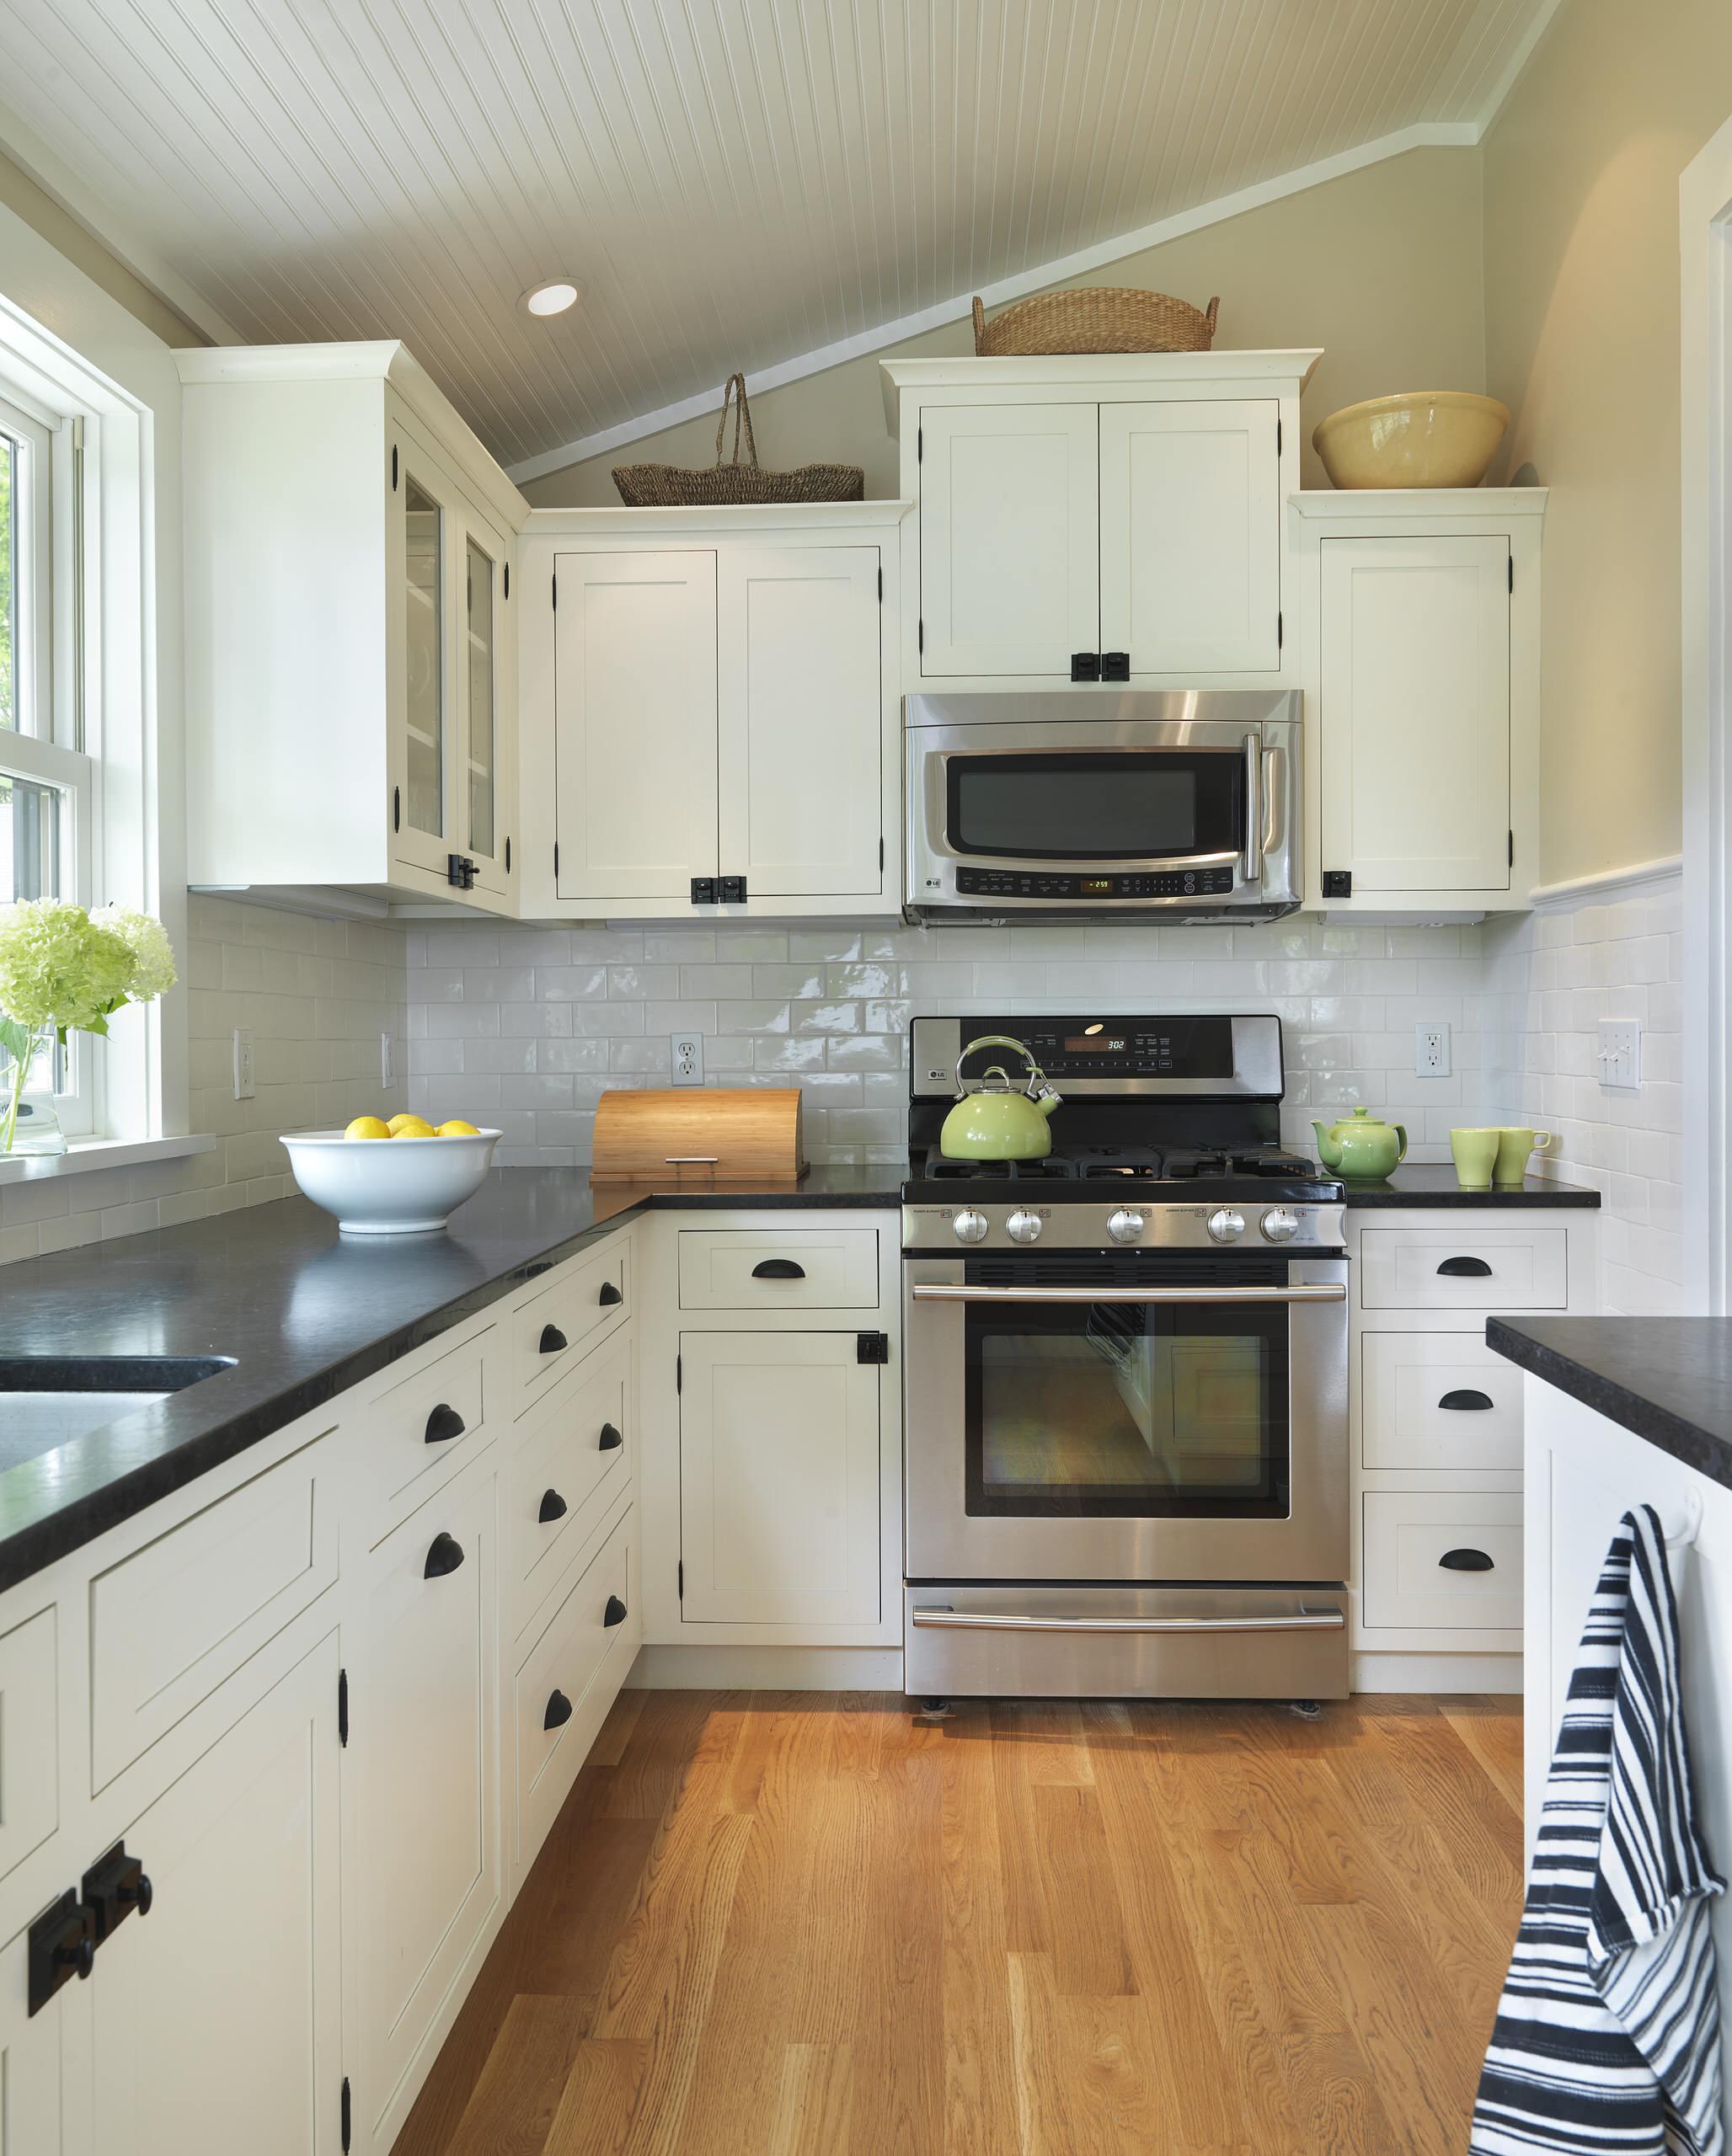 White Cabinets Black Appliances Traditional Kitchen Breakfast Bar Ceiling Lighting Dark Floor